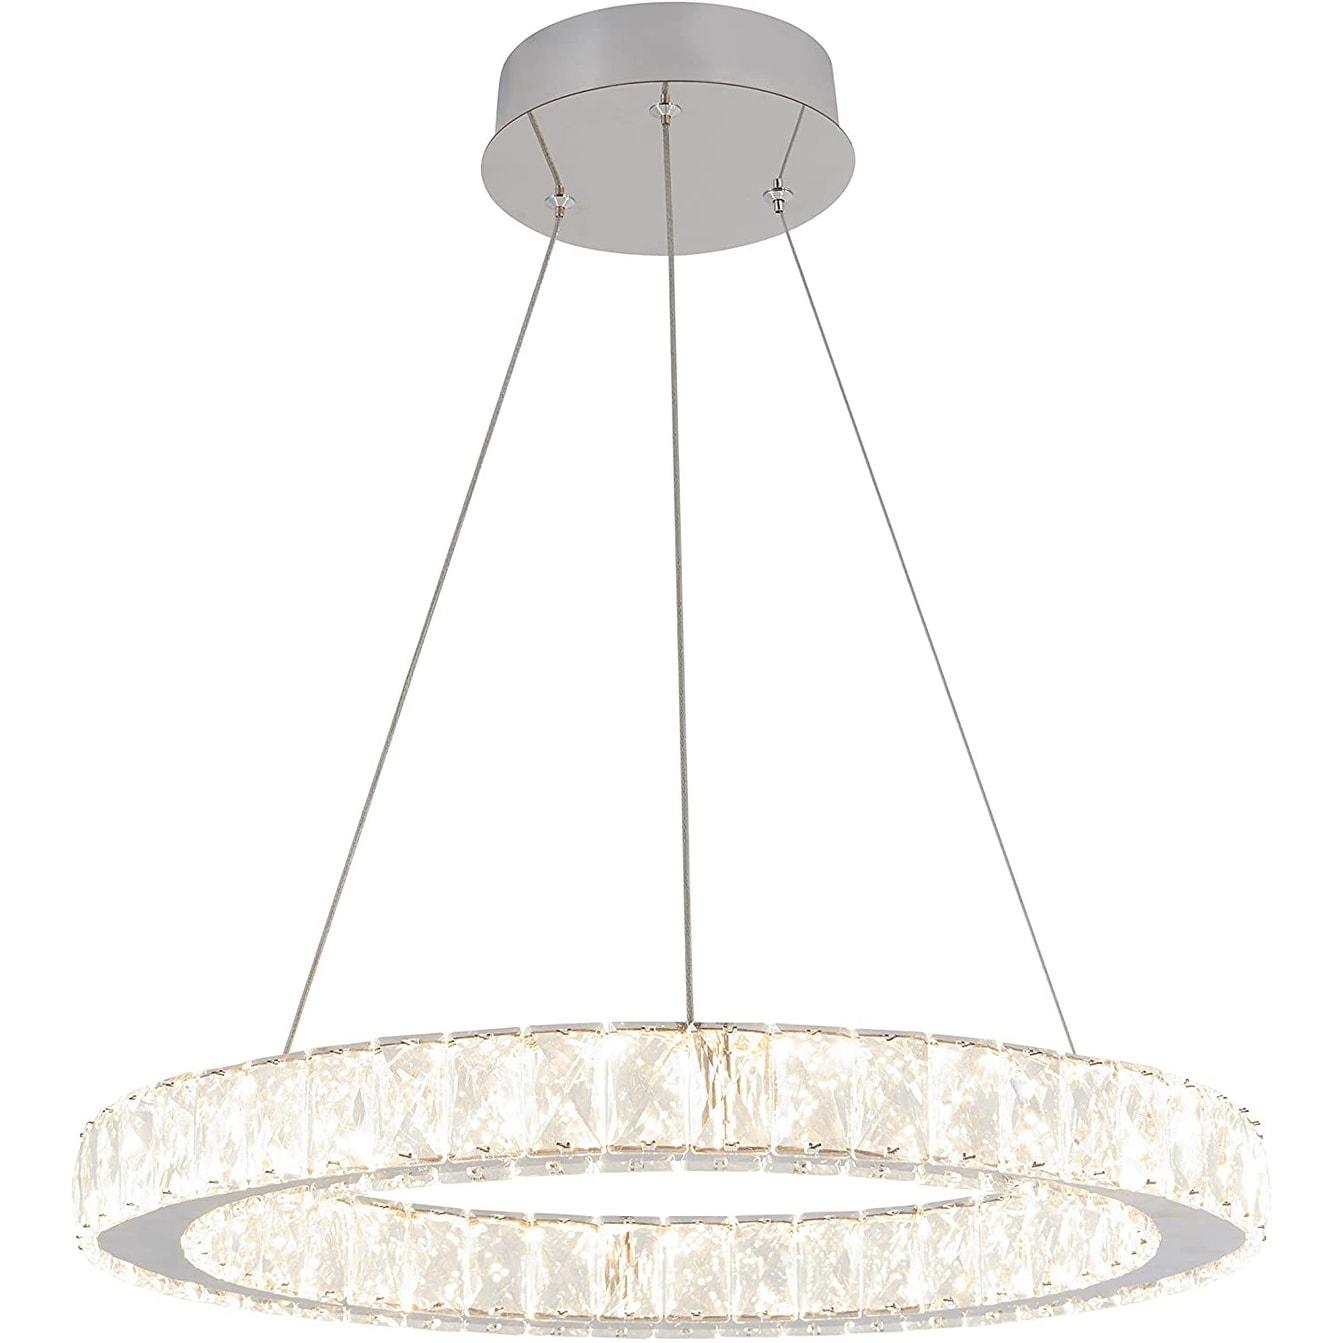 Shop Artika Modern Celebrity Round Rings Crystal Chandelier For Dining Room Chrome Finish Overstock 31484311